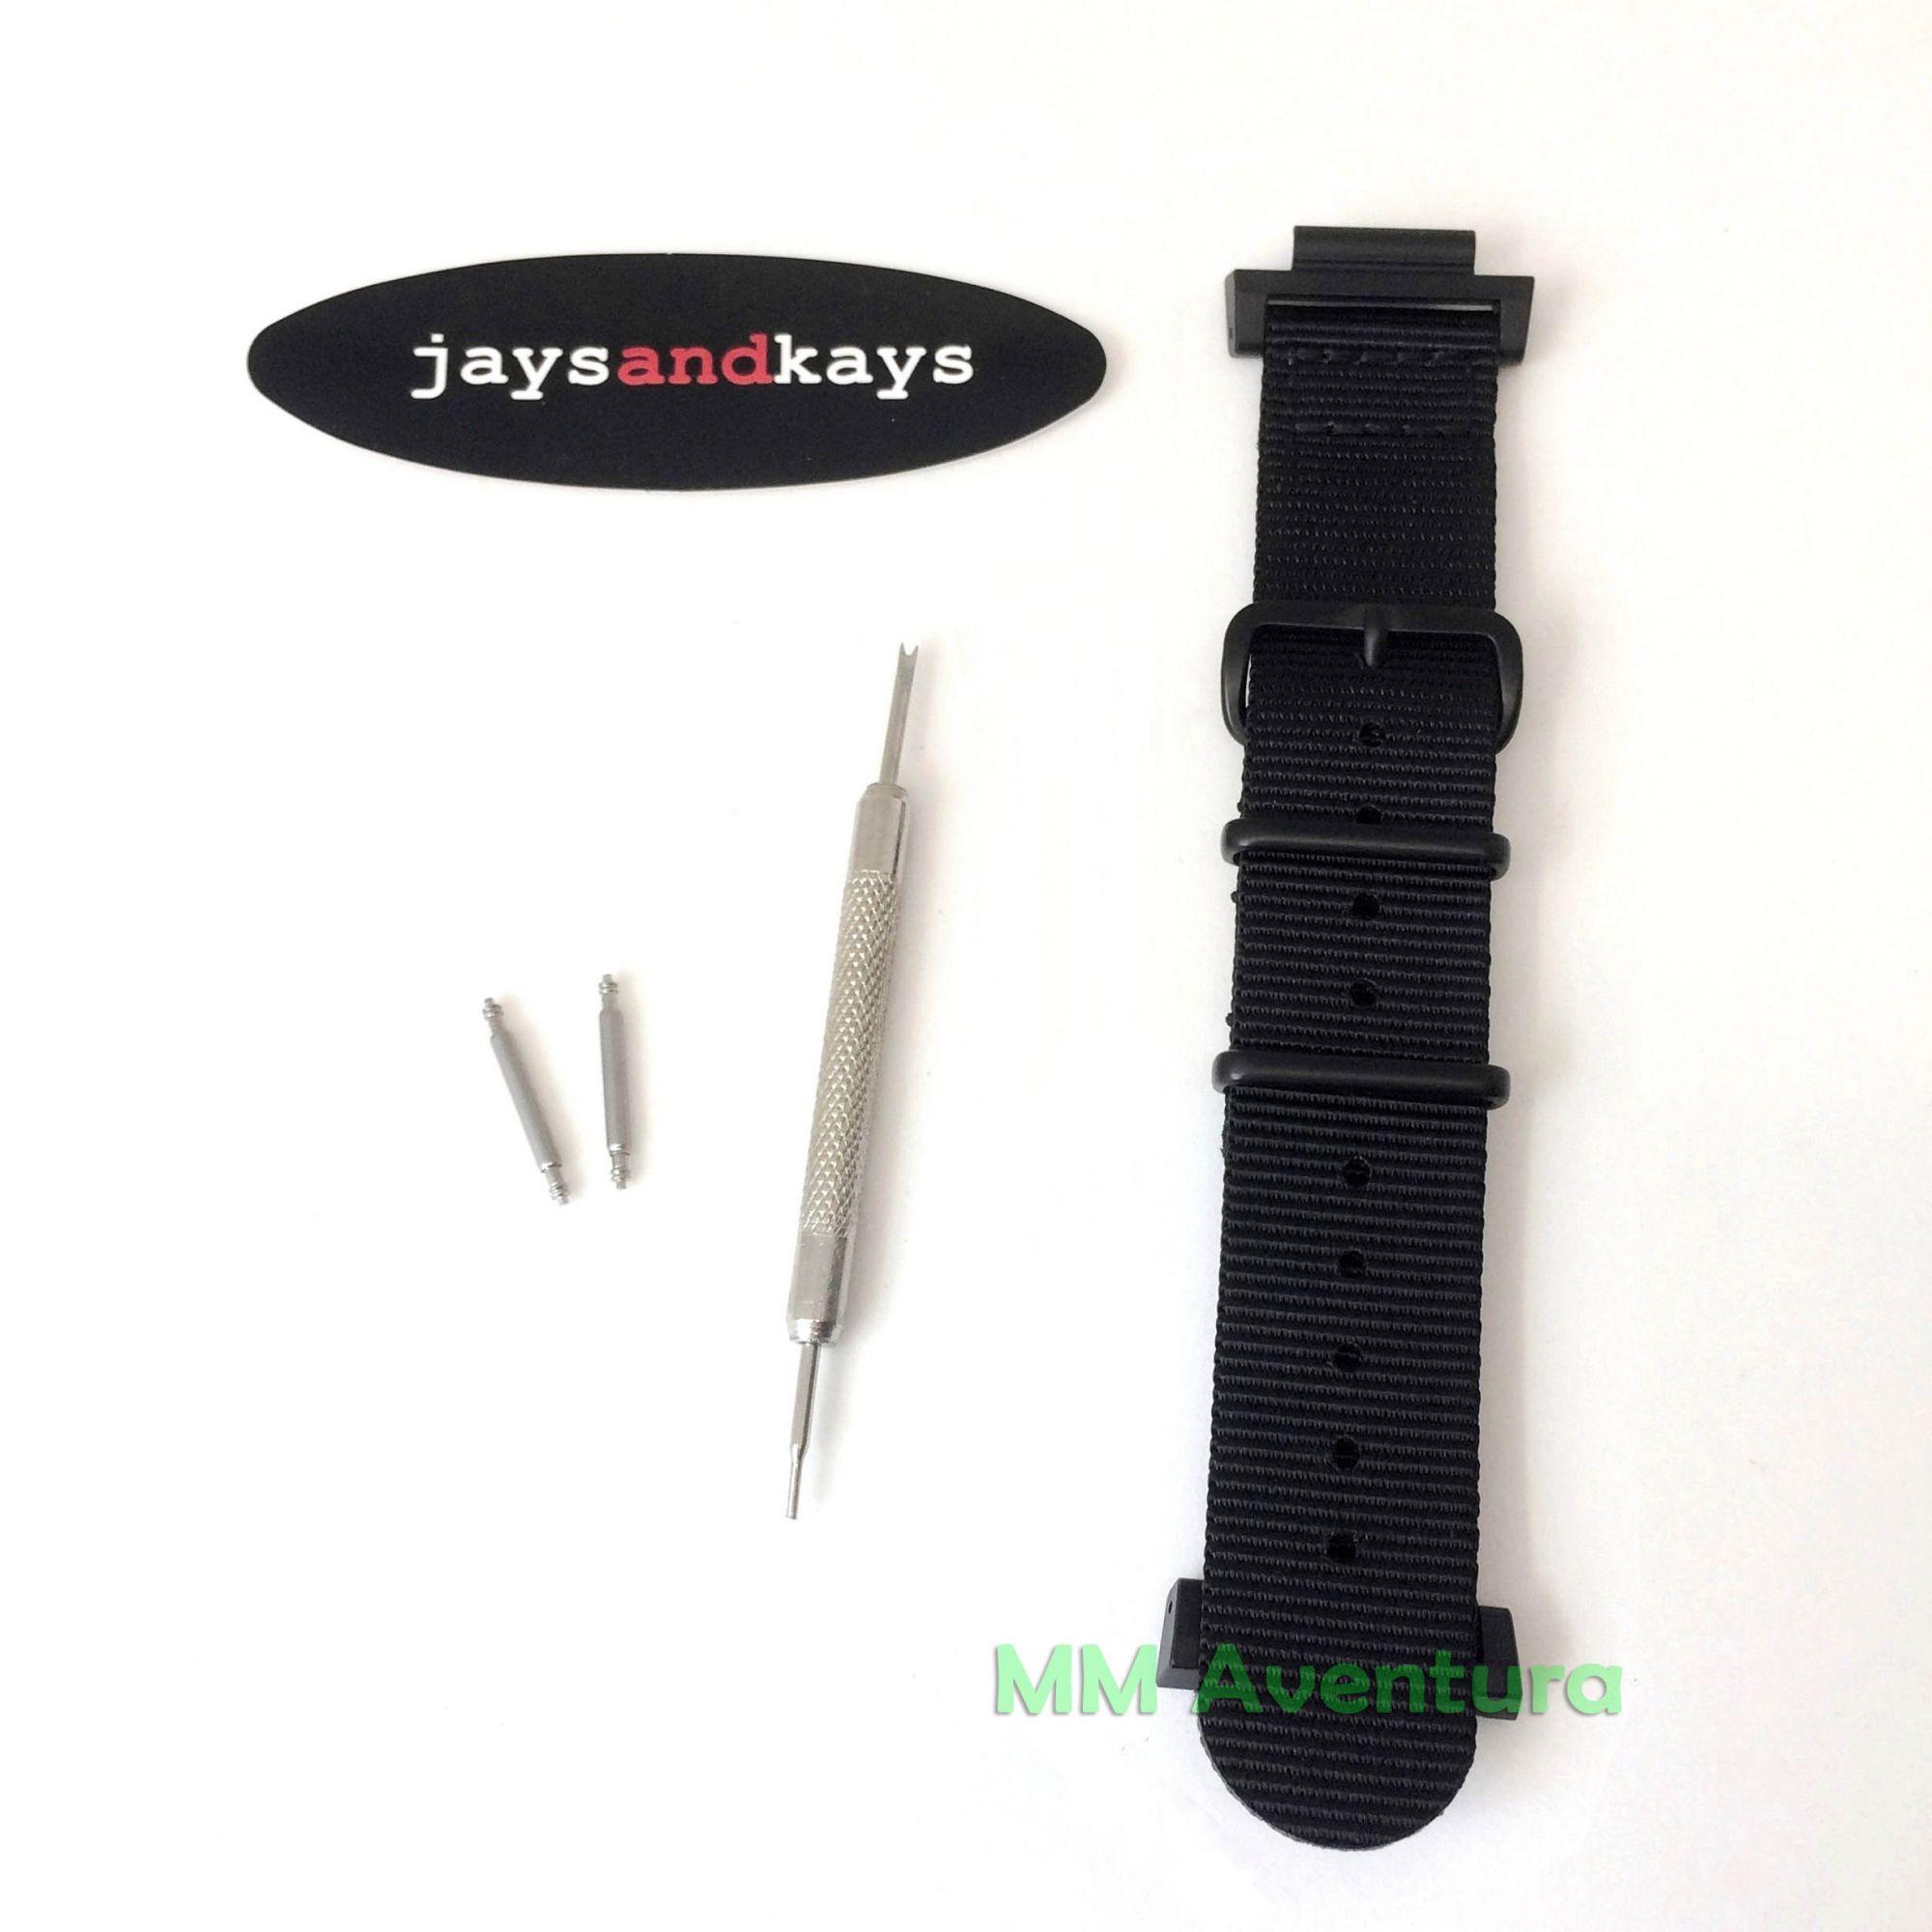 Pulseira Nylon 2 pç Nato Zulu JaysAndKays p/ G-Shock 22mm - GX56 GD350 GA110 etc